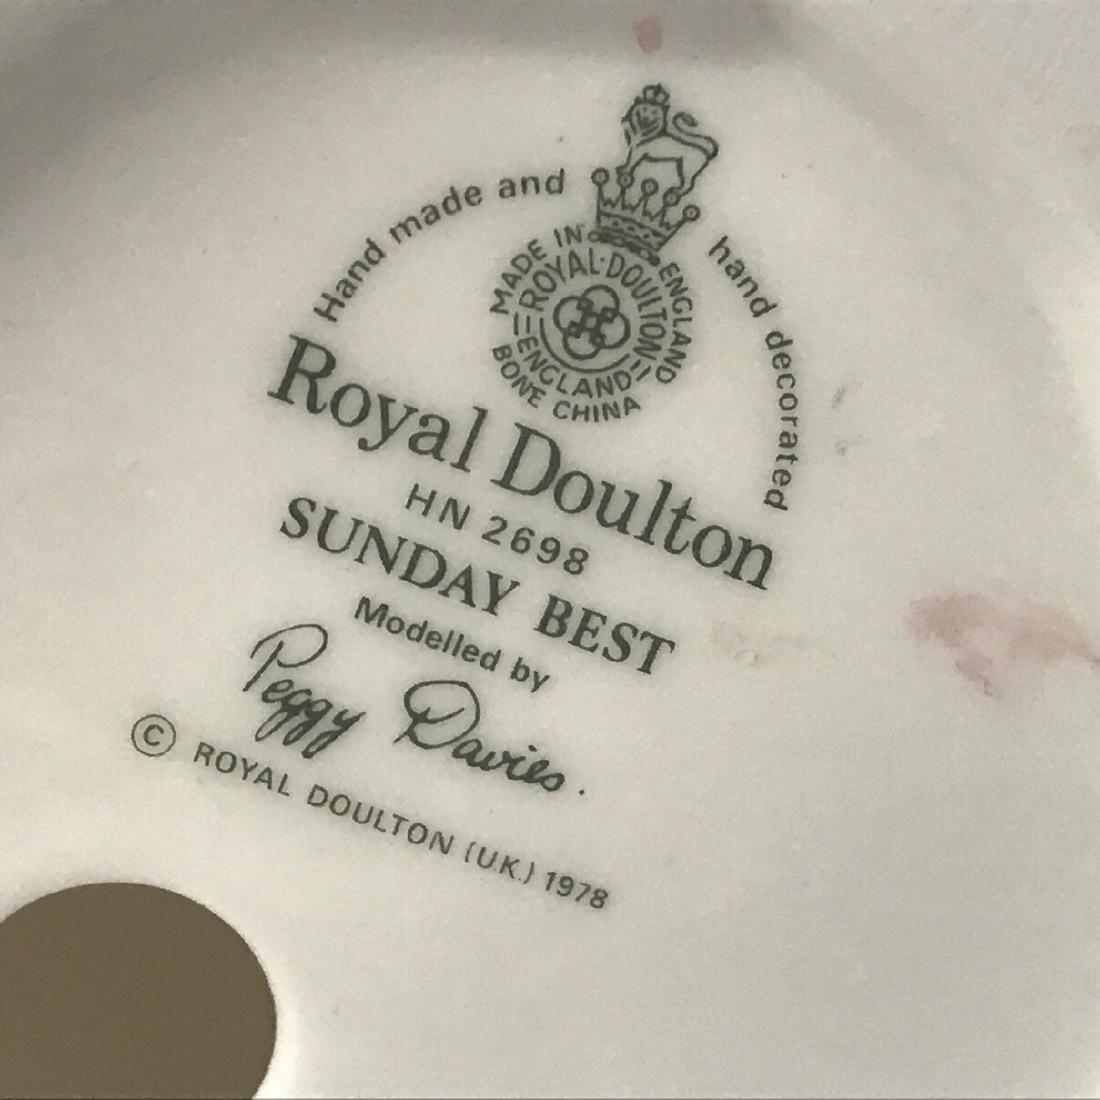 Sunday Best Royal Doulton Figurine - 6